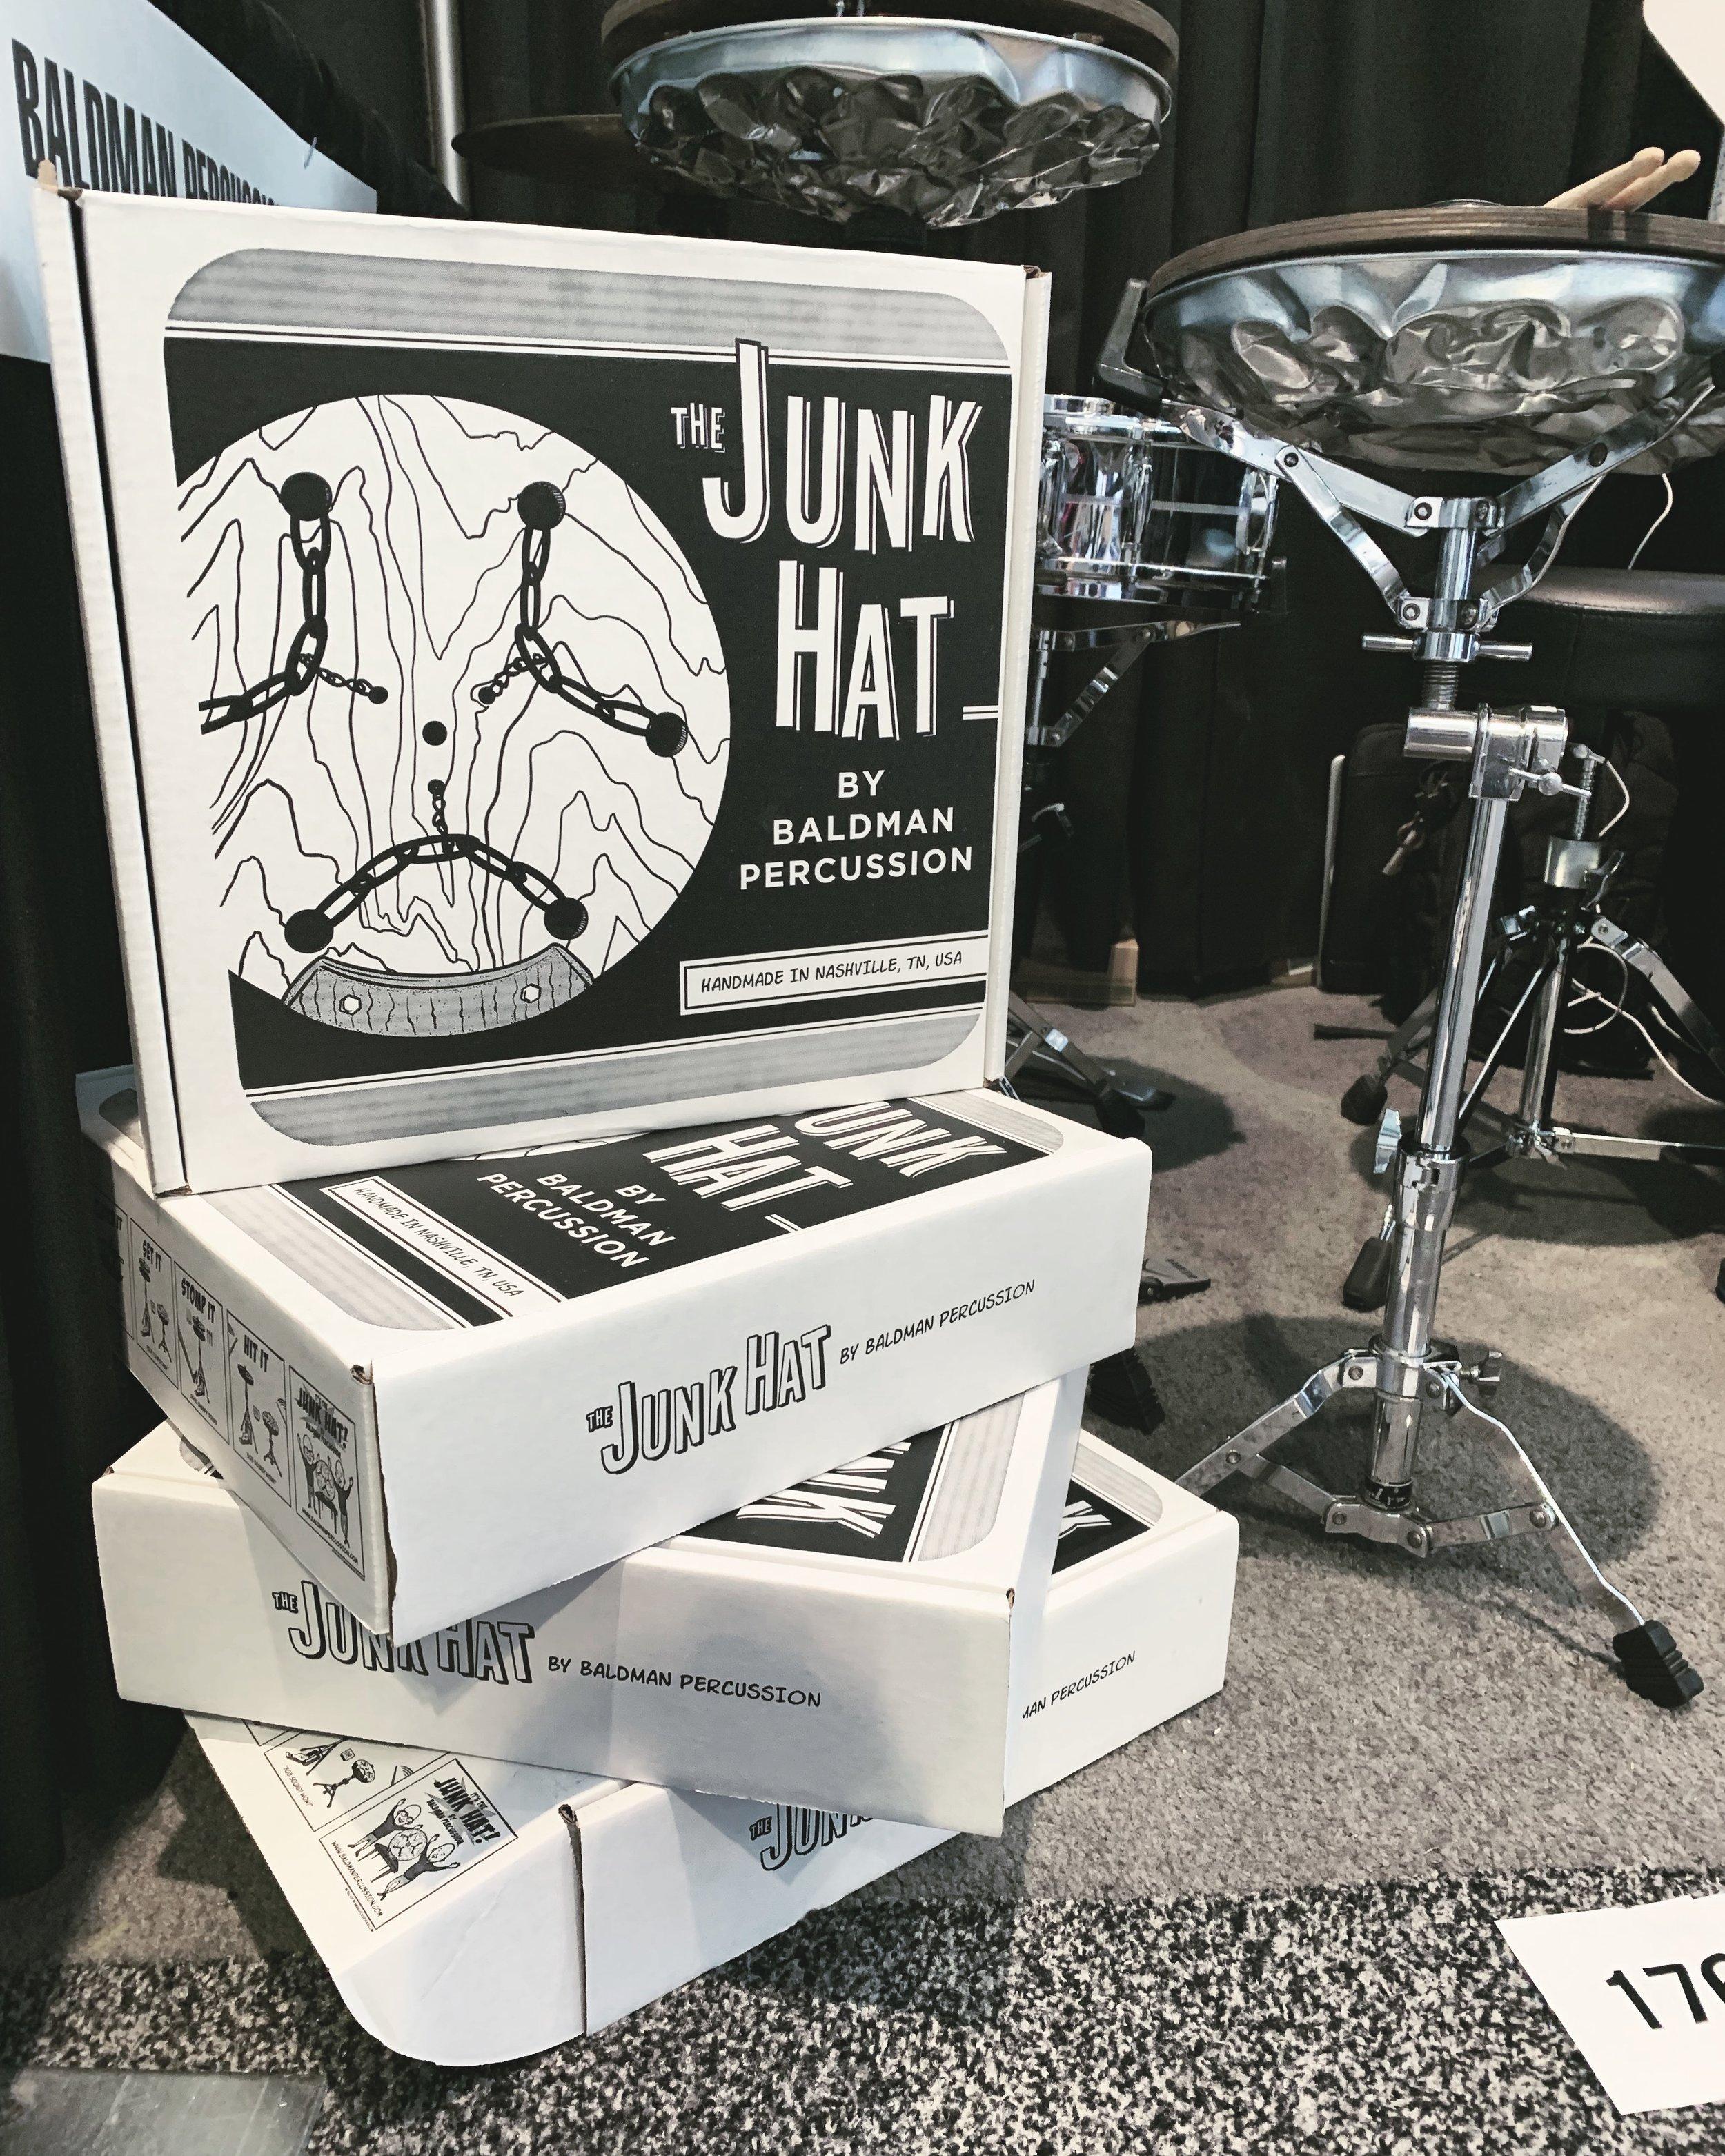 Baldman_Percussion_JunkHat-201907-01.JPG